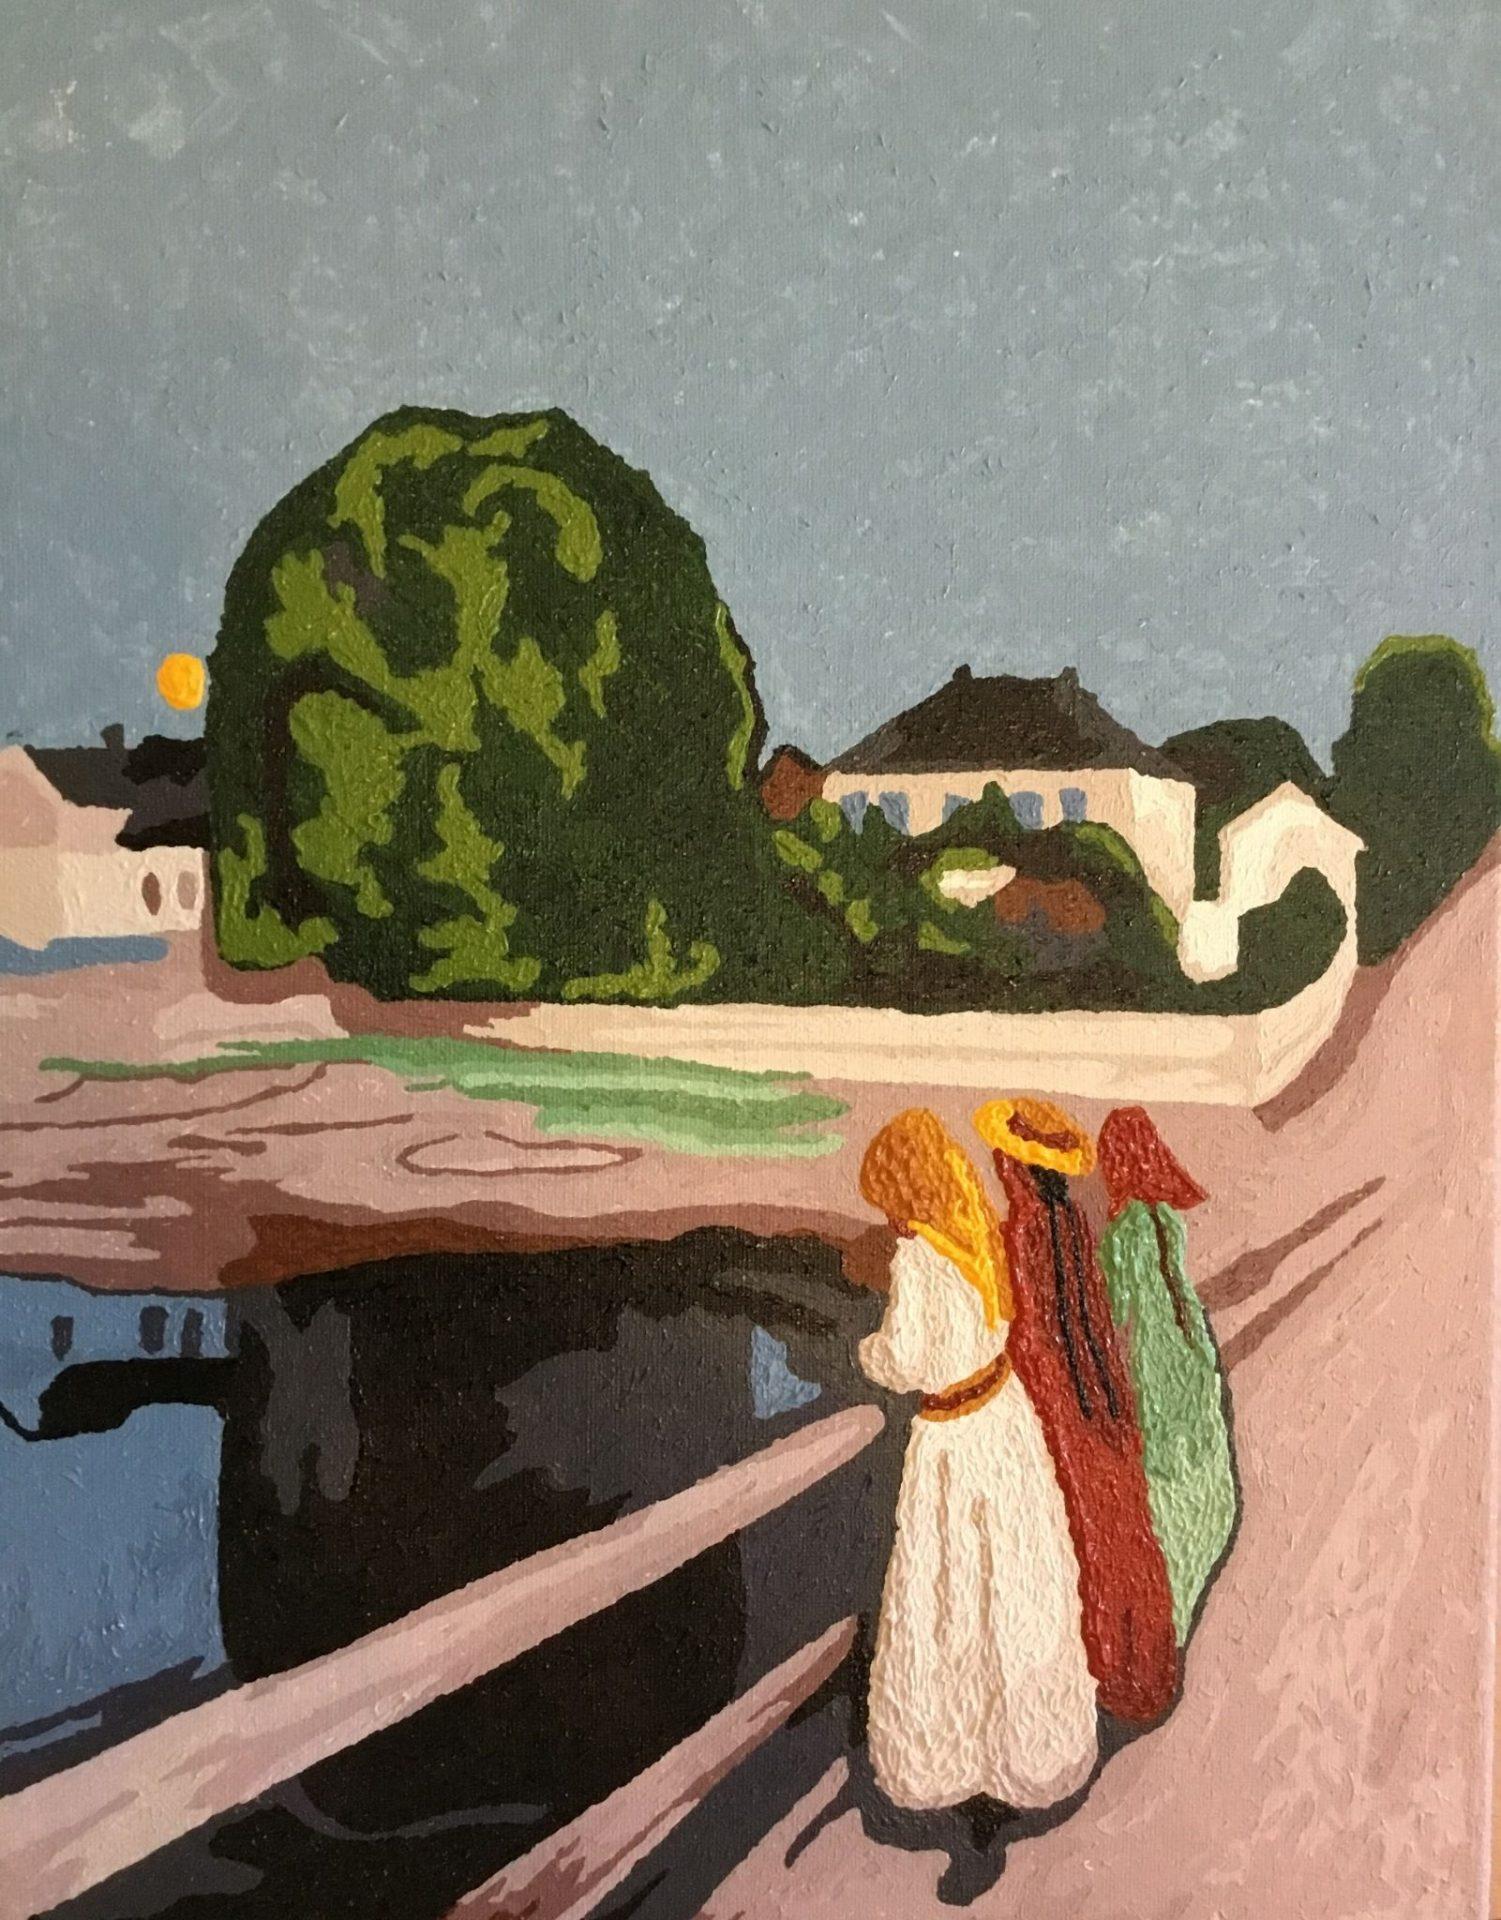 Barbara L - Masterpiece